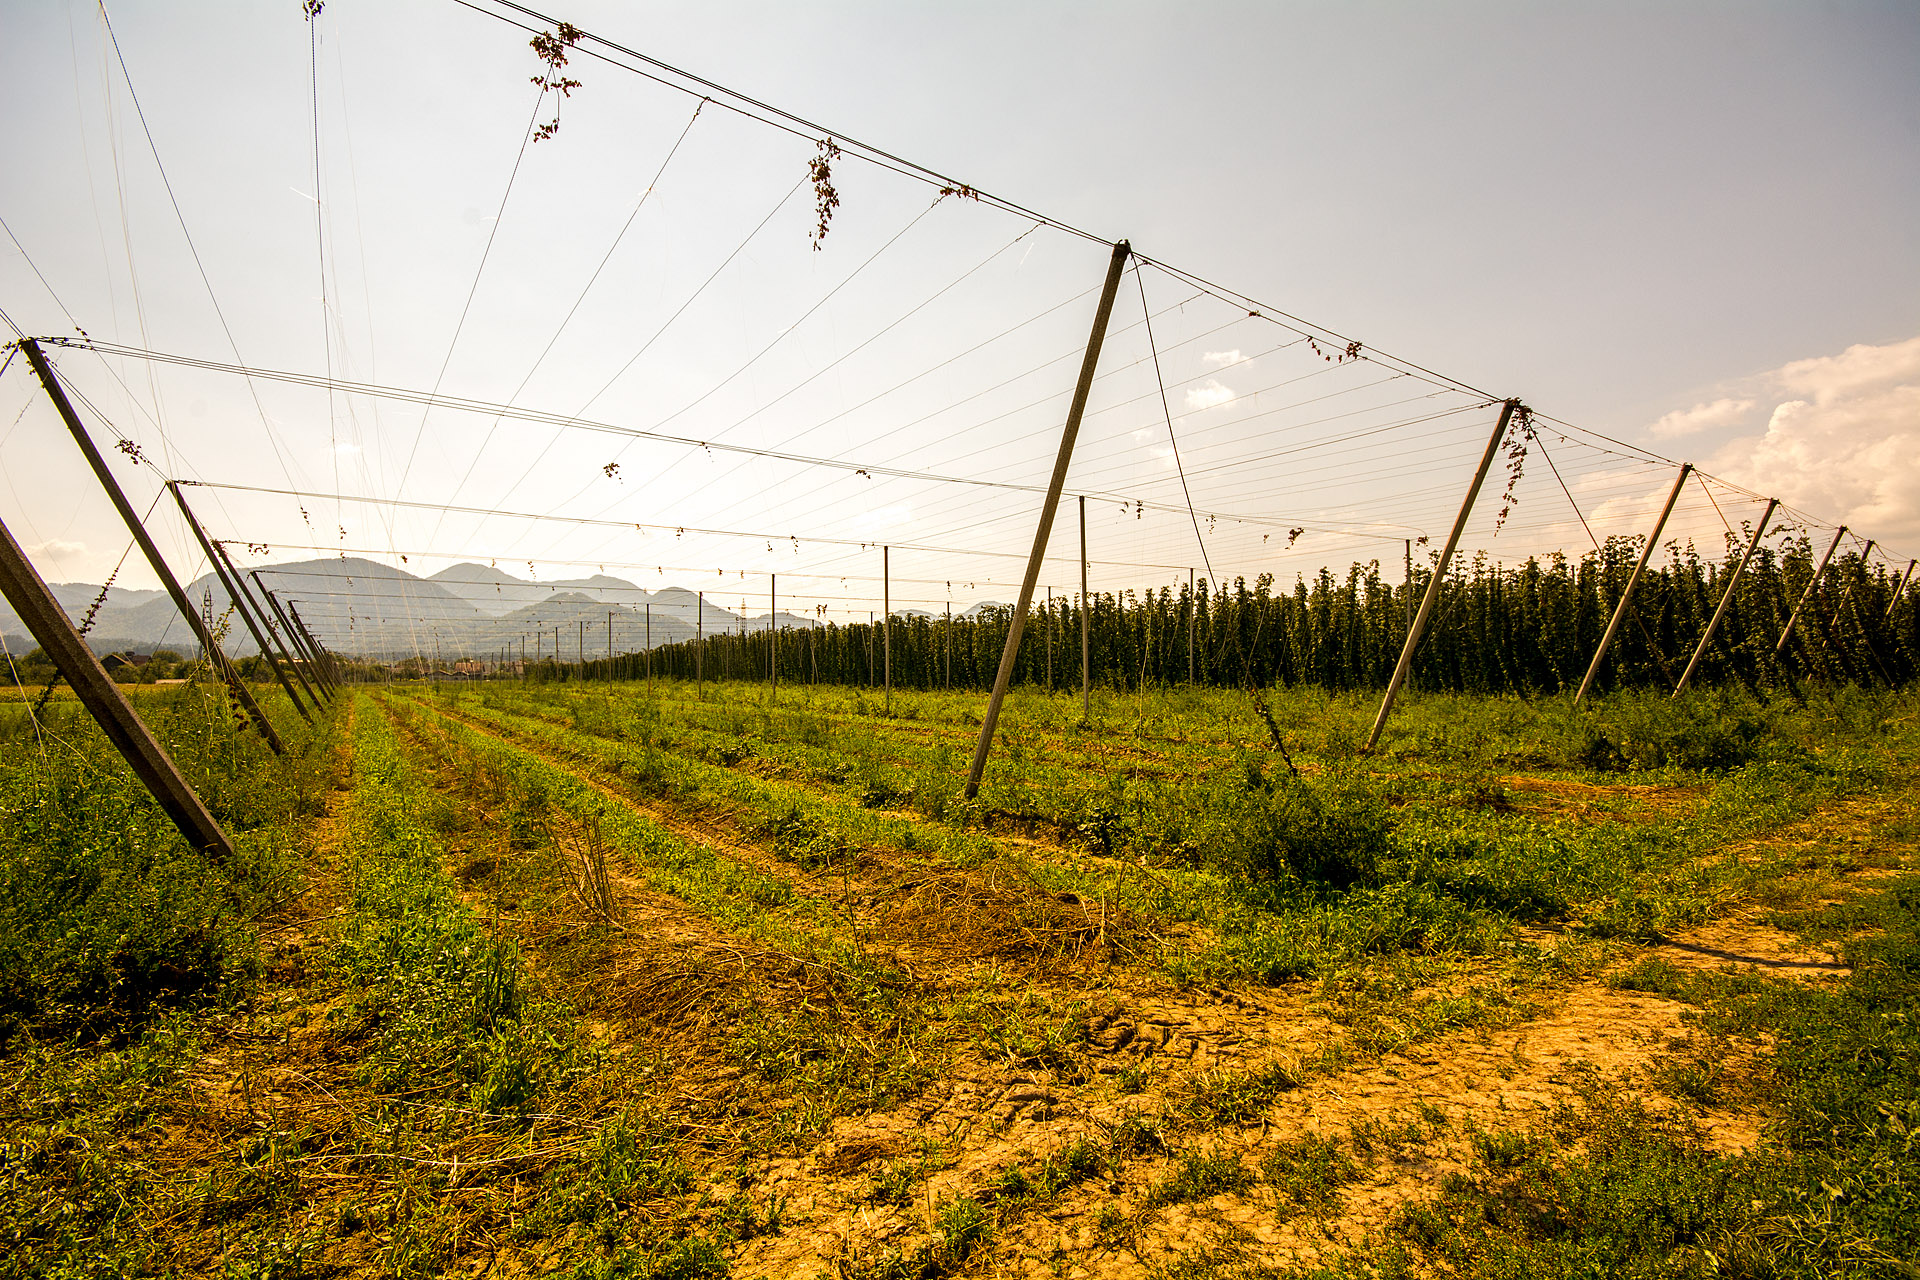 Savinja Valley (Zalec) hops